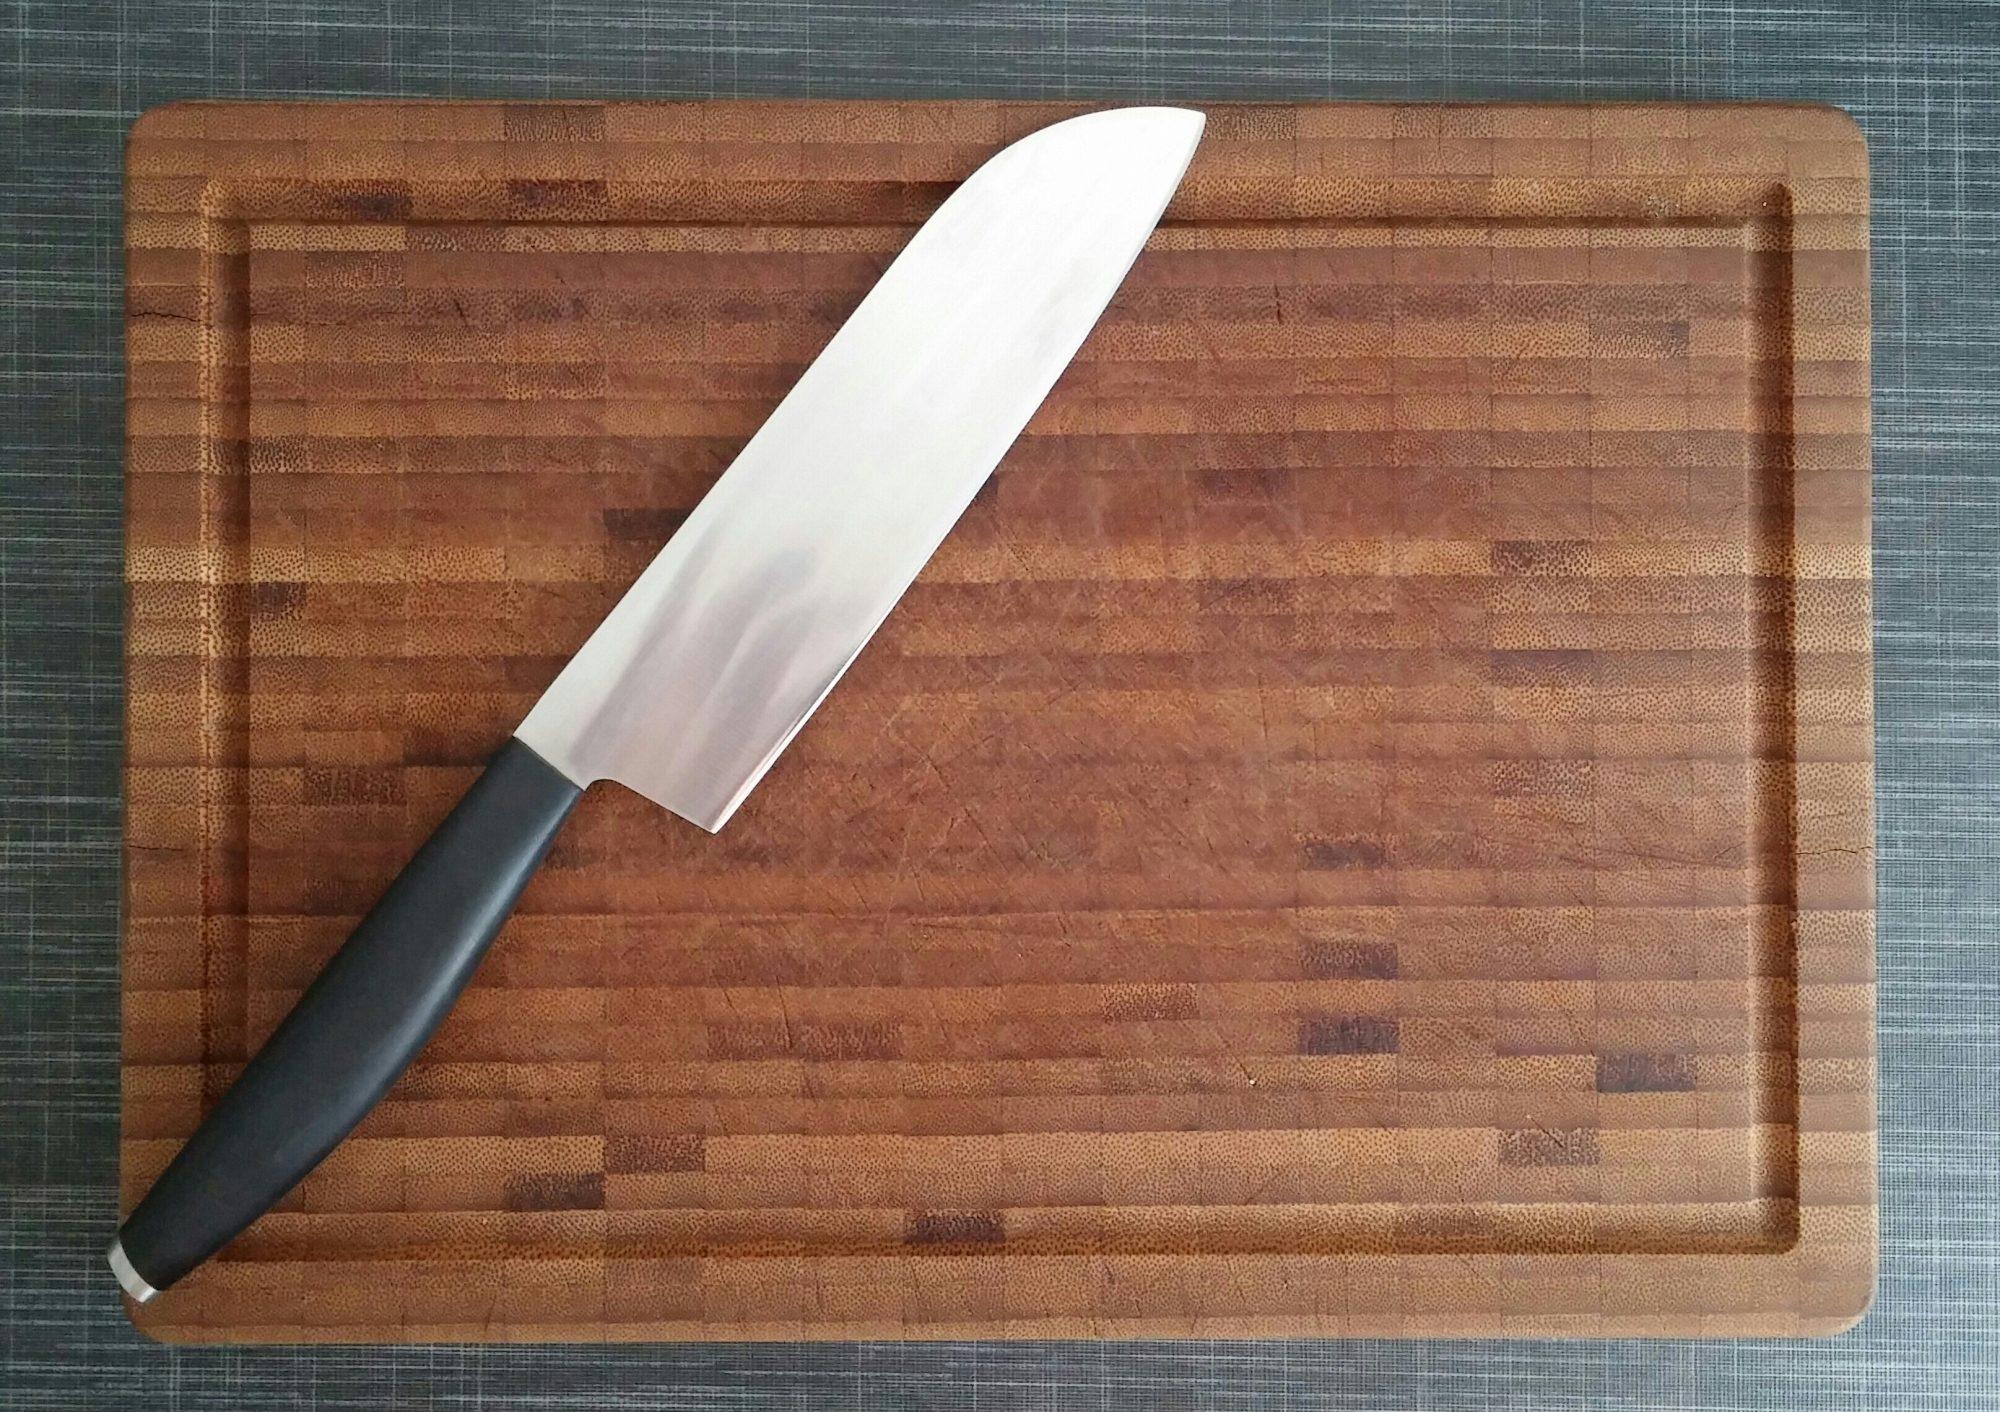 Knife and cutting board Getty 8/6/20